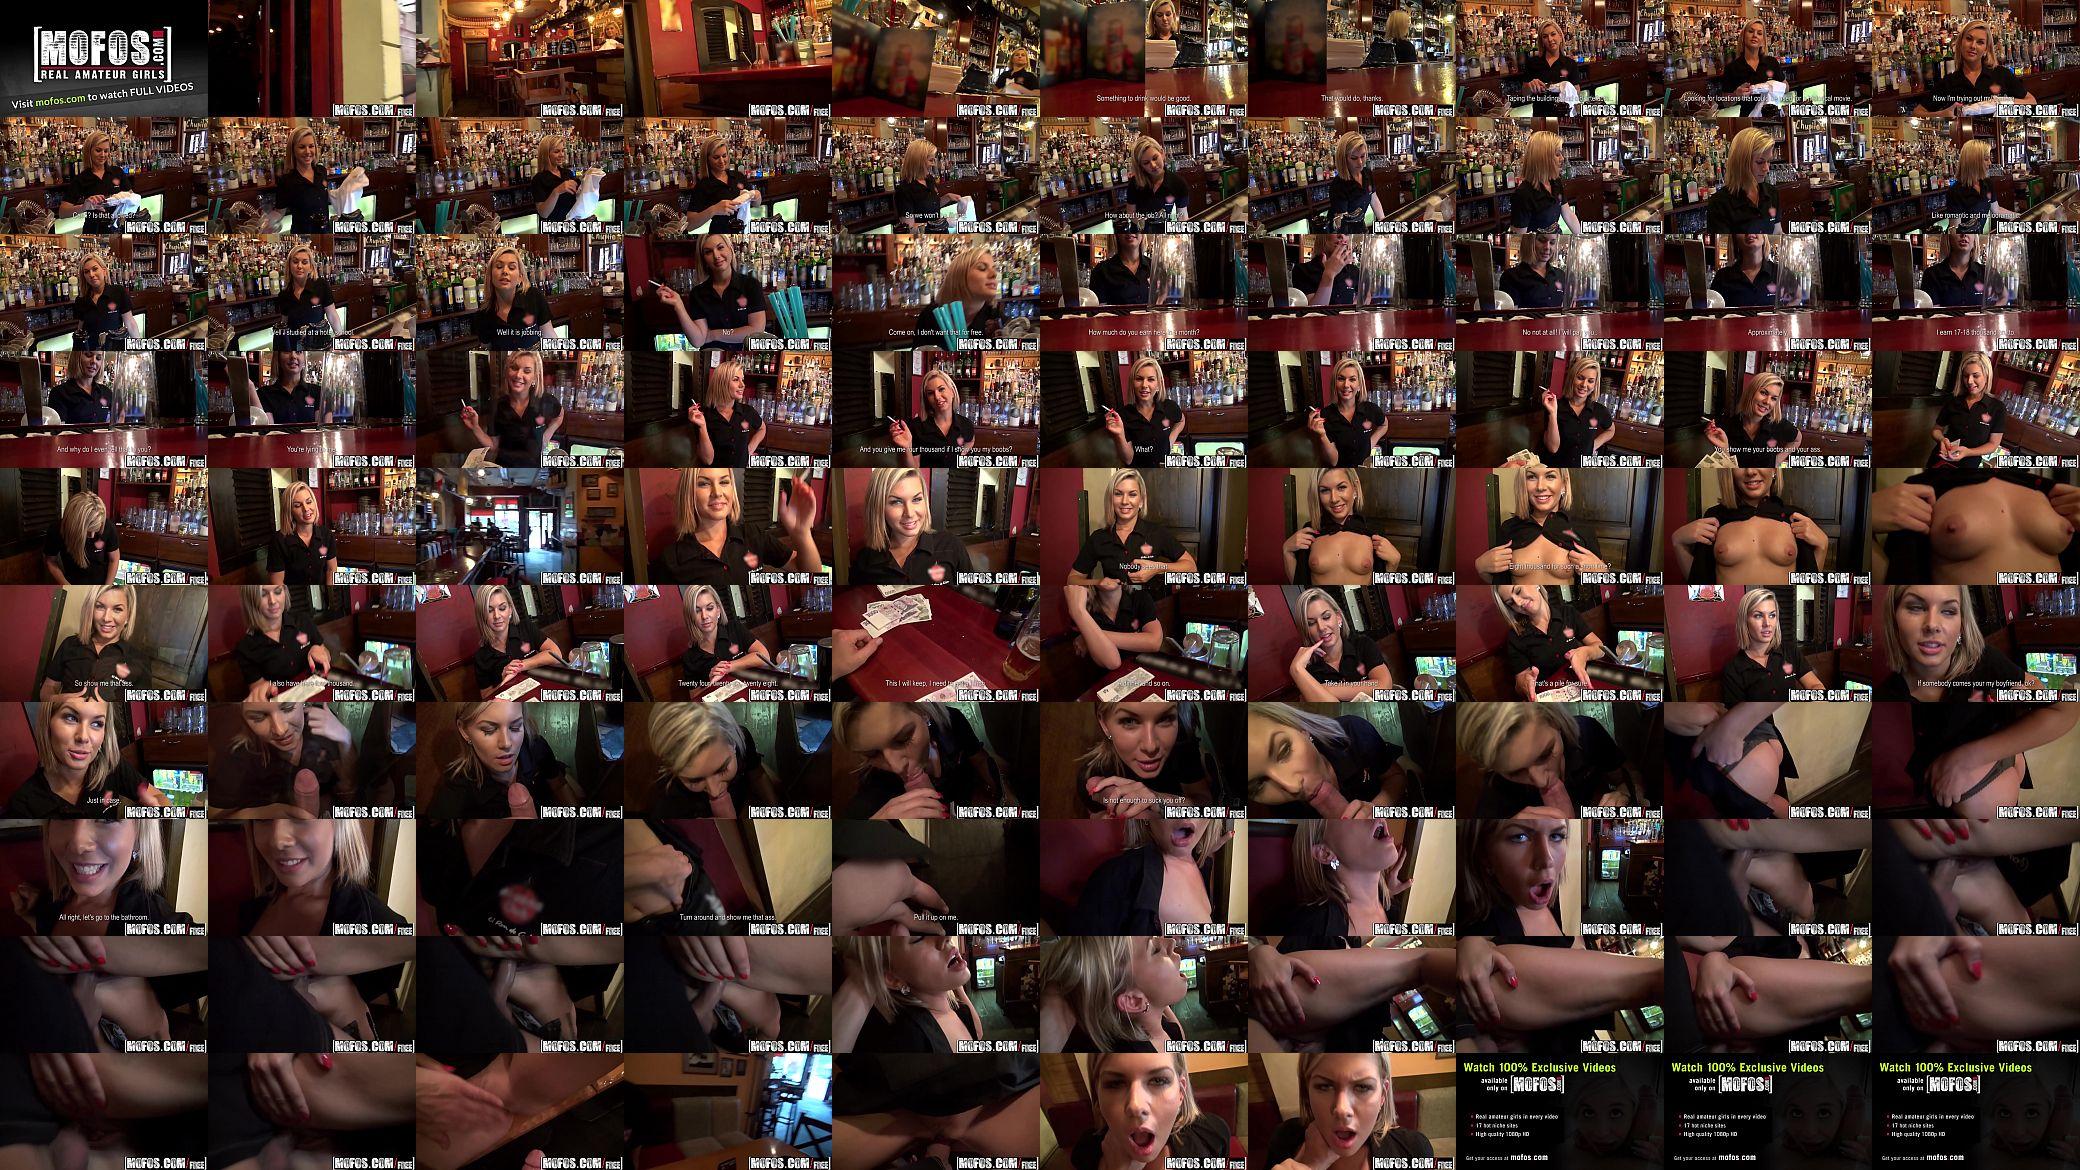 Bar Pickup Mofos Porn public pick ups - barmaid got laid starring rihanna samuel